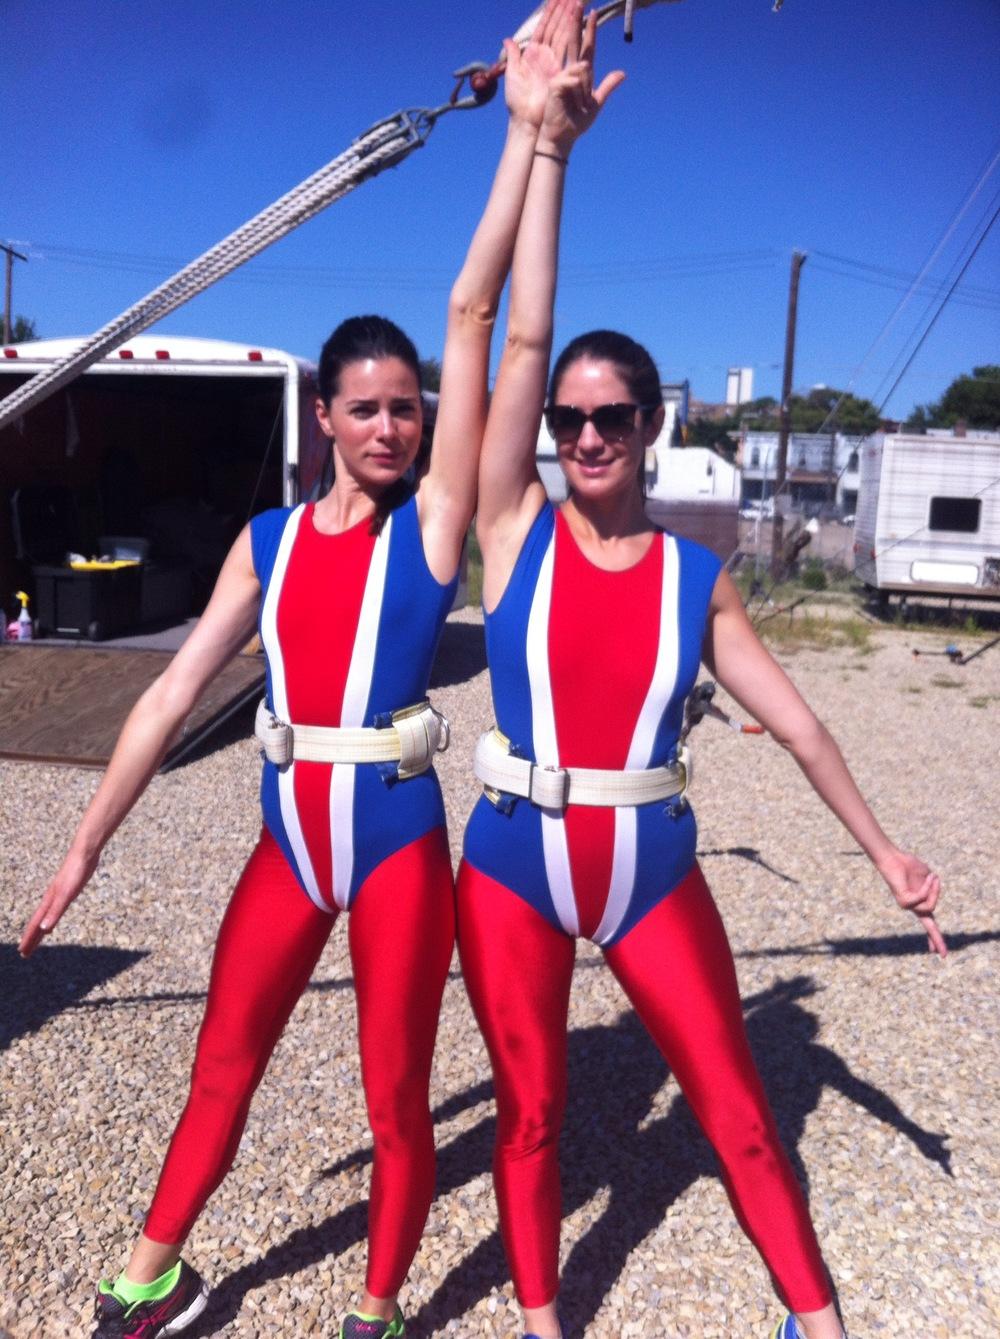 Fly School Circus Arts, Philadelphia, PA, Circus Arts, Fly School Circus Arts, Flying, Trapeze, Flying Trapeze